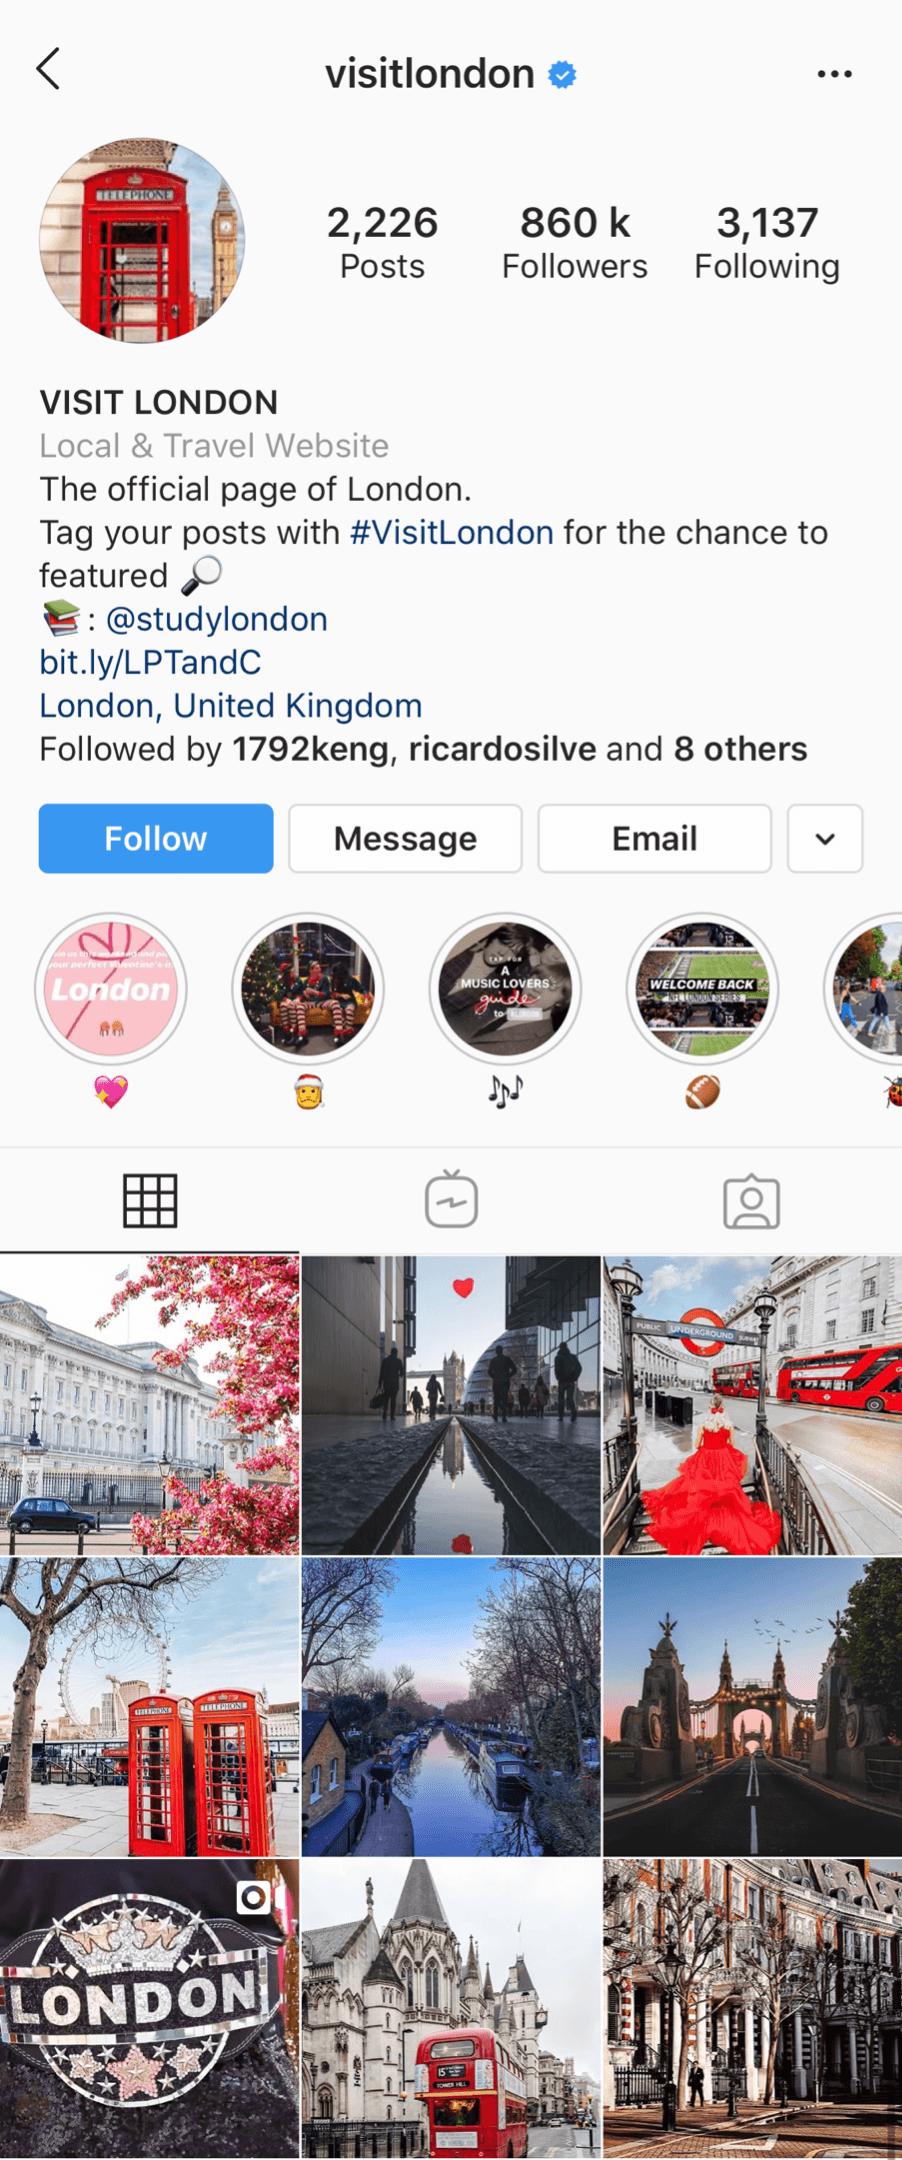 @visitlondon Instagram account